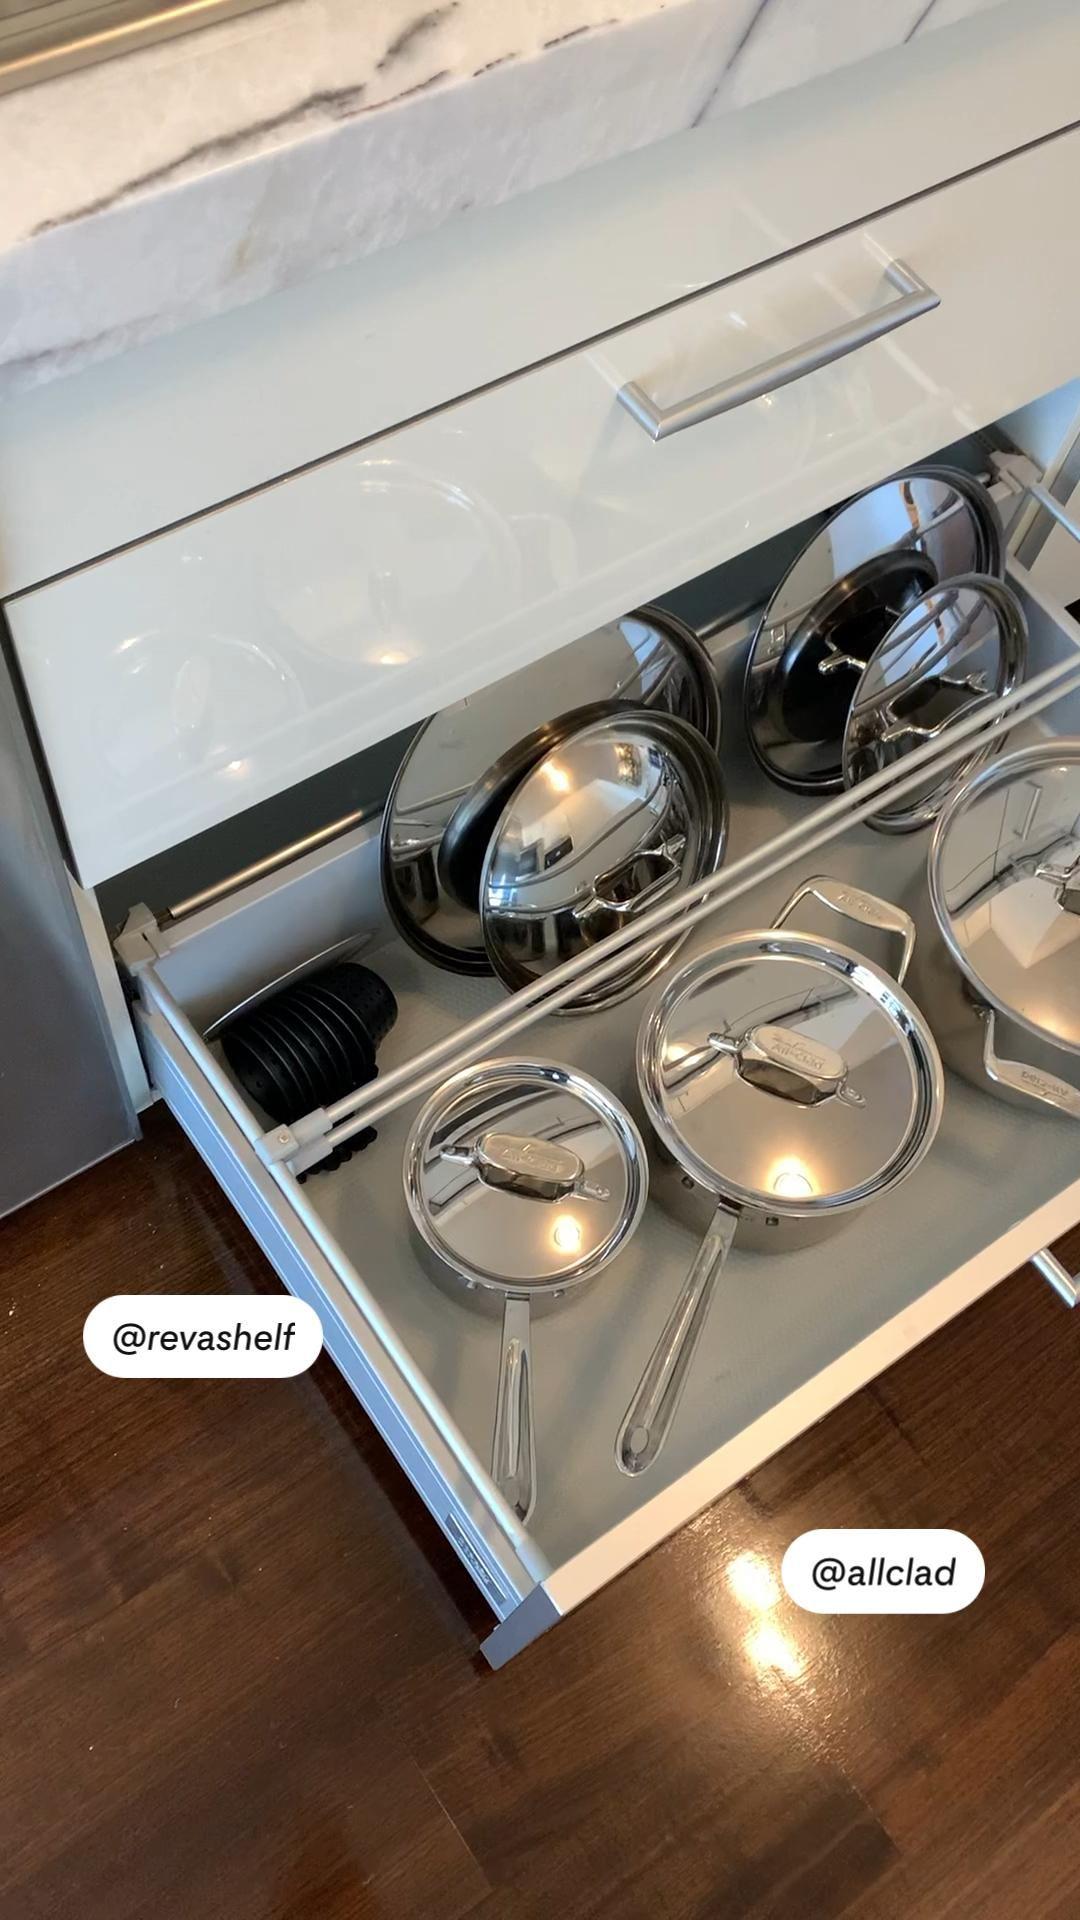 SieMatic's new sliding drawer system